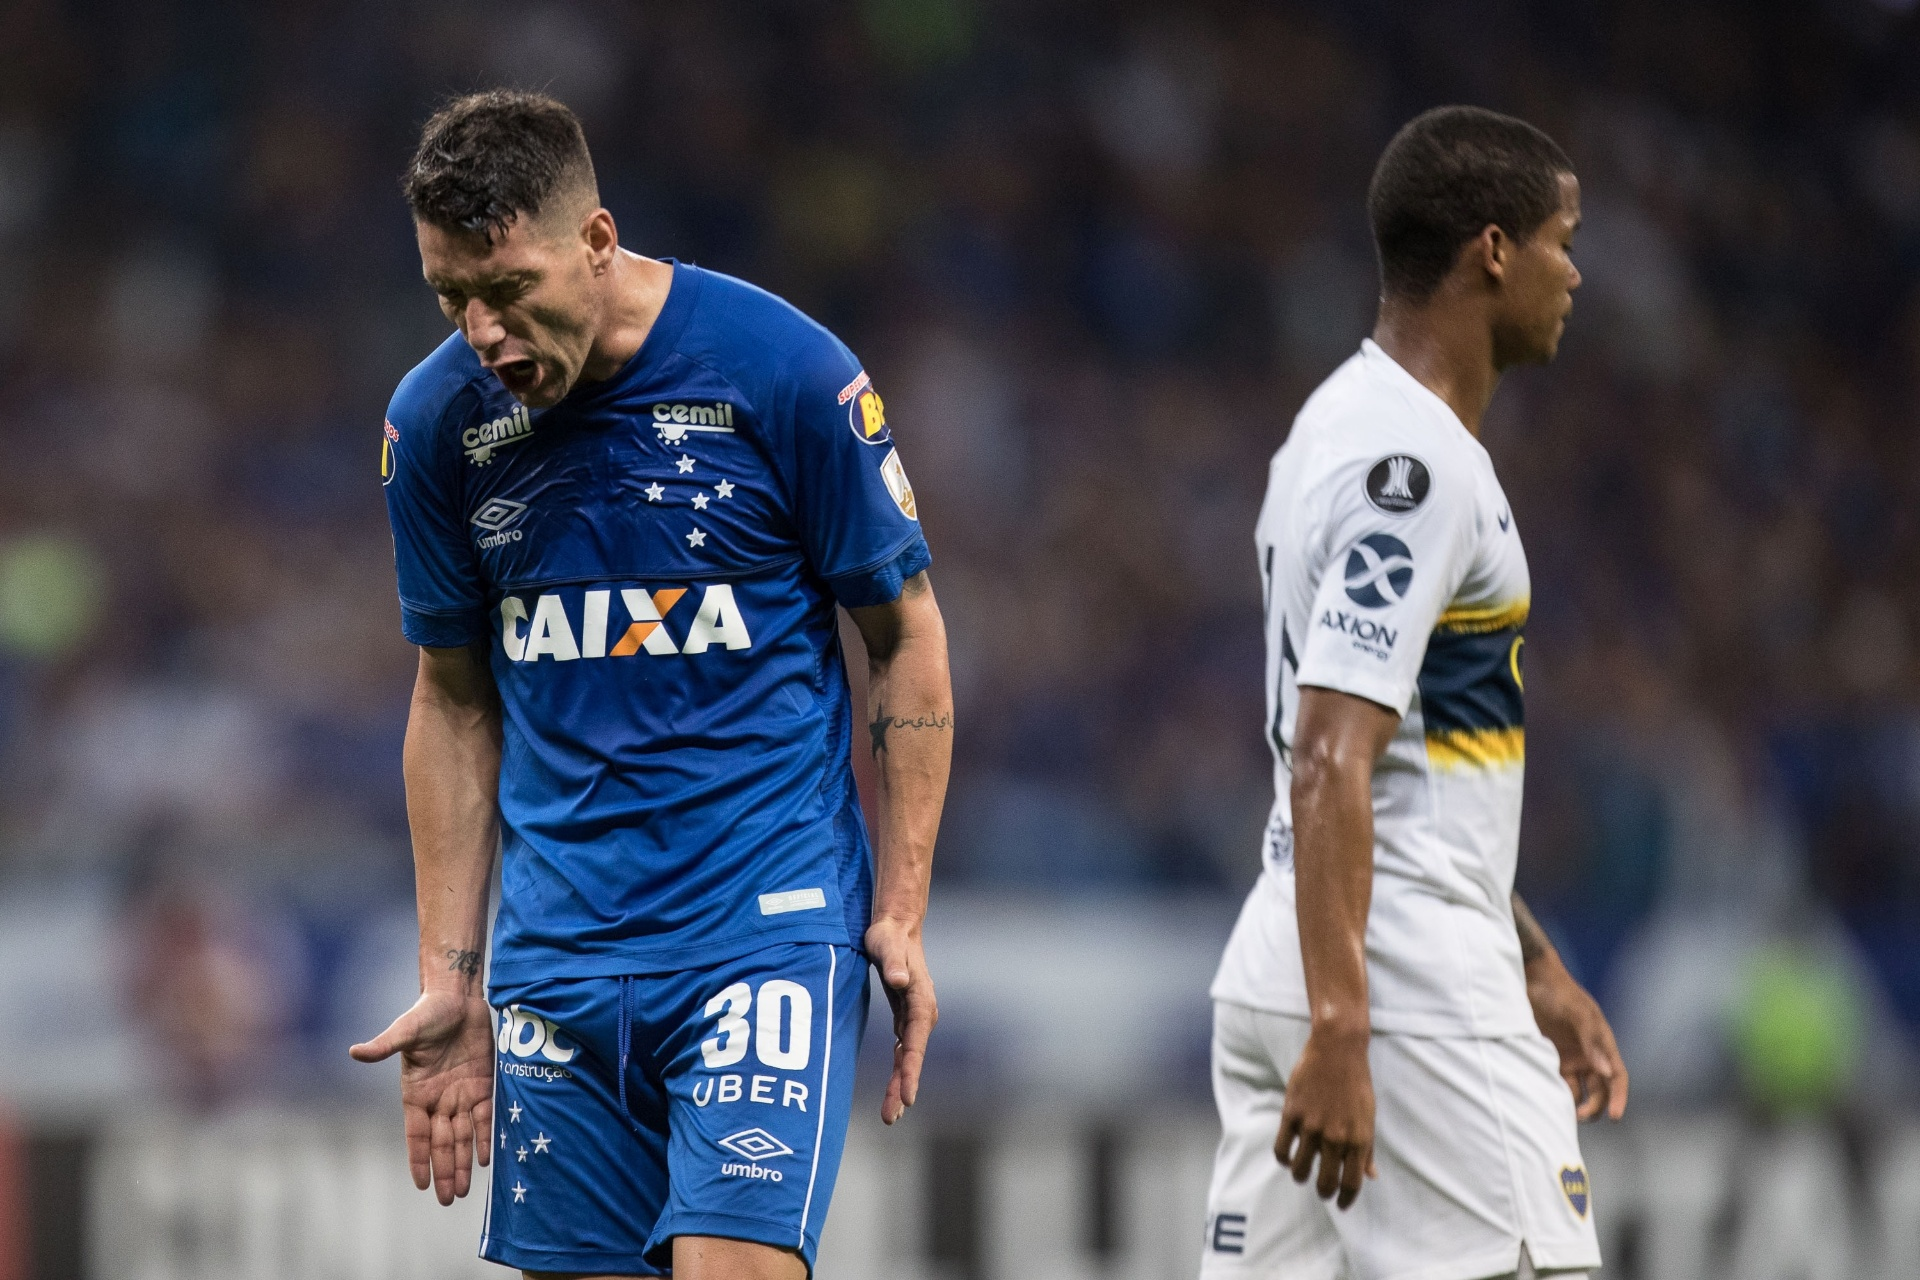 Alvo do Grêmio fb52d7be9ed9b